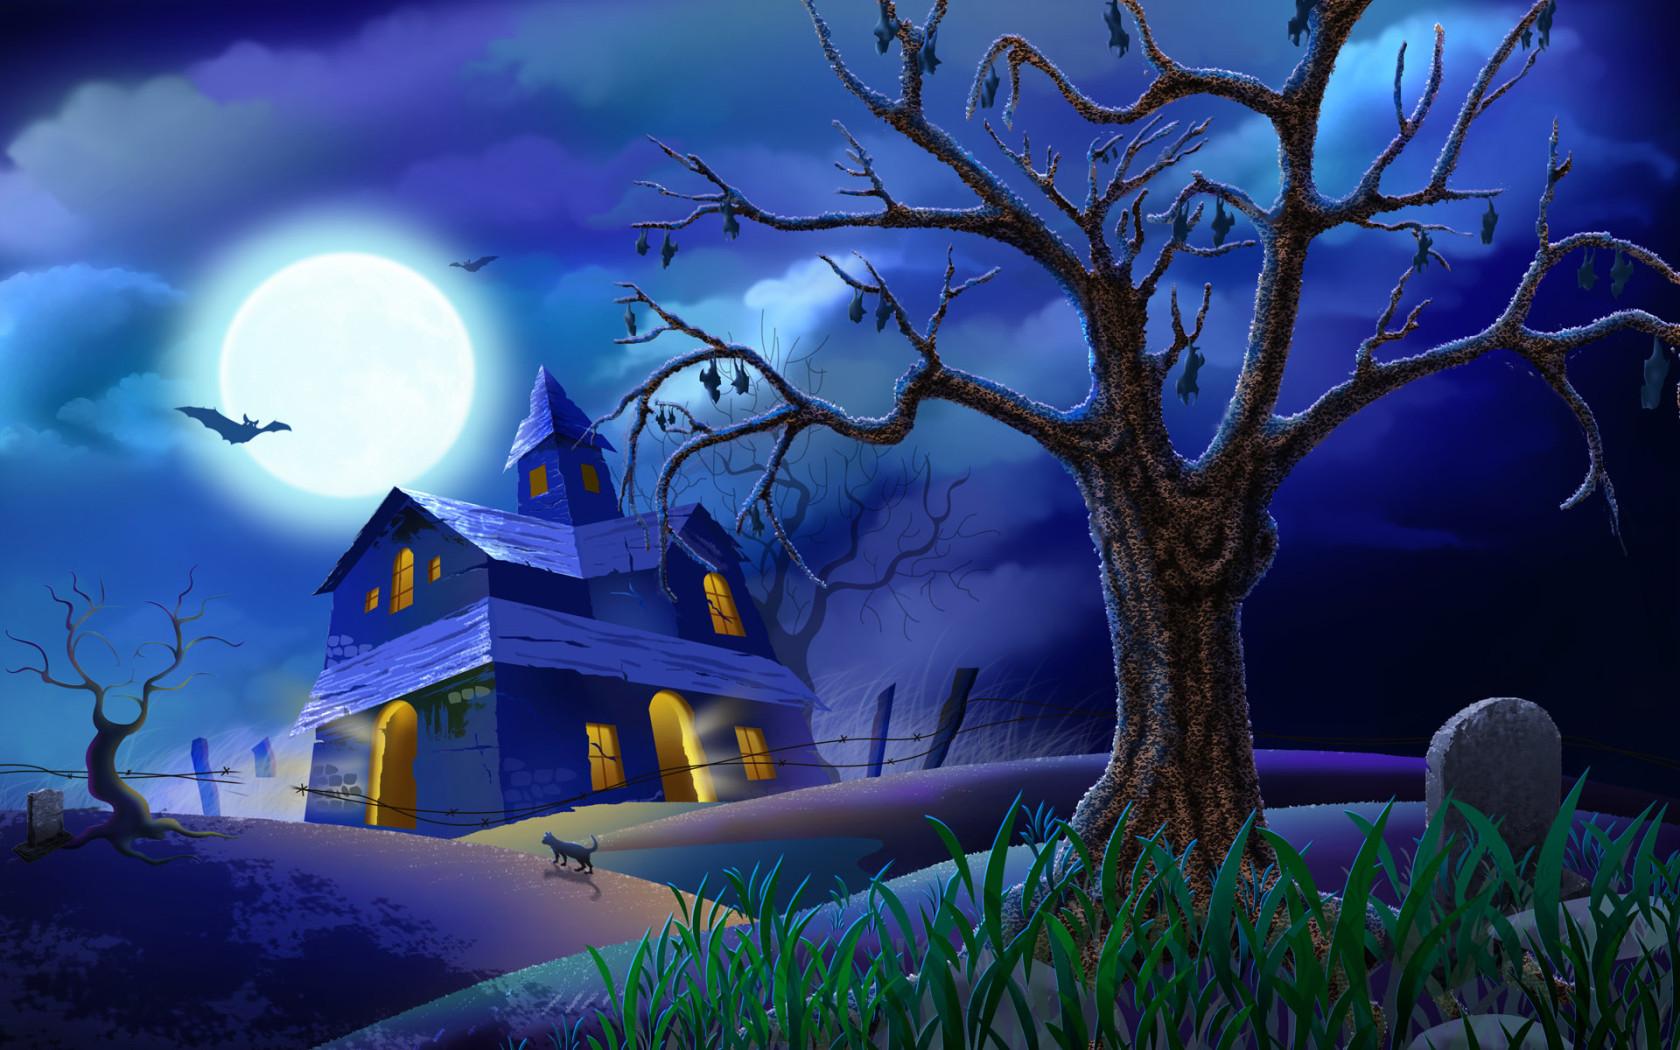 fondos halloween wallpapers gratis - photo #25